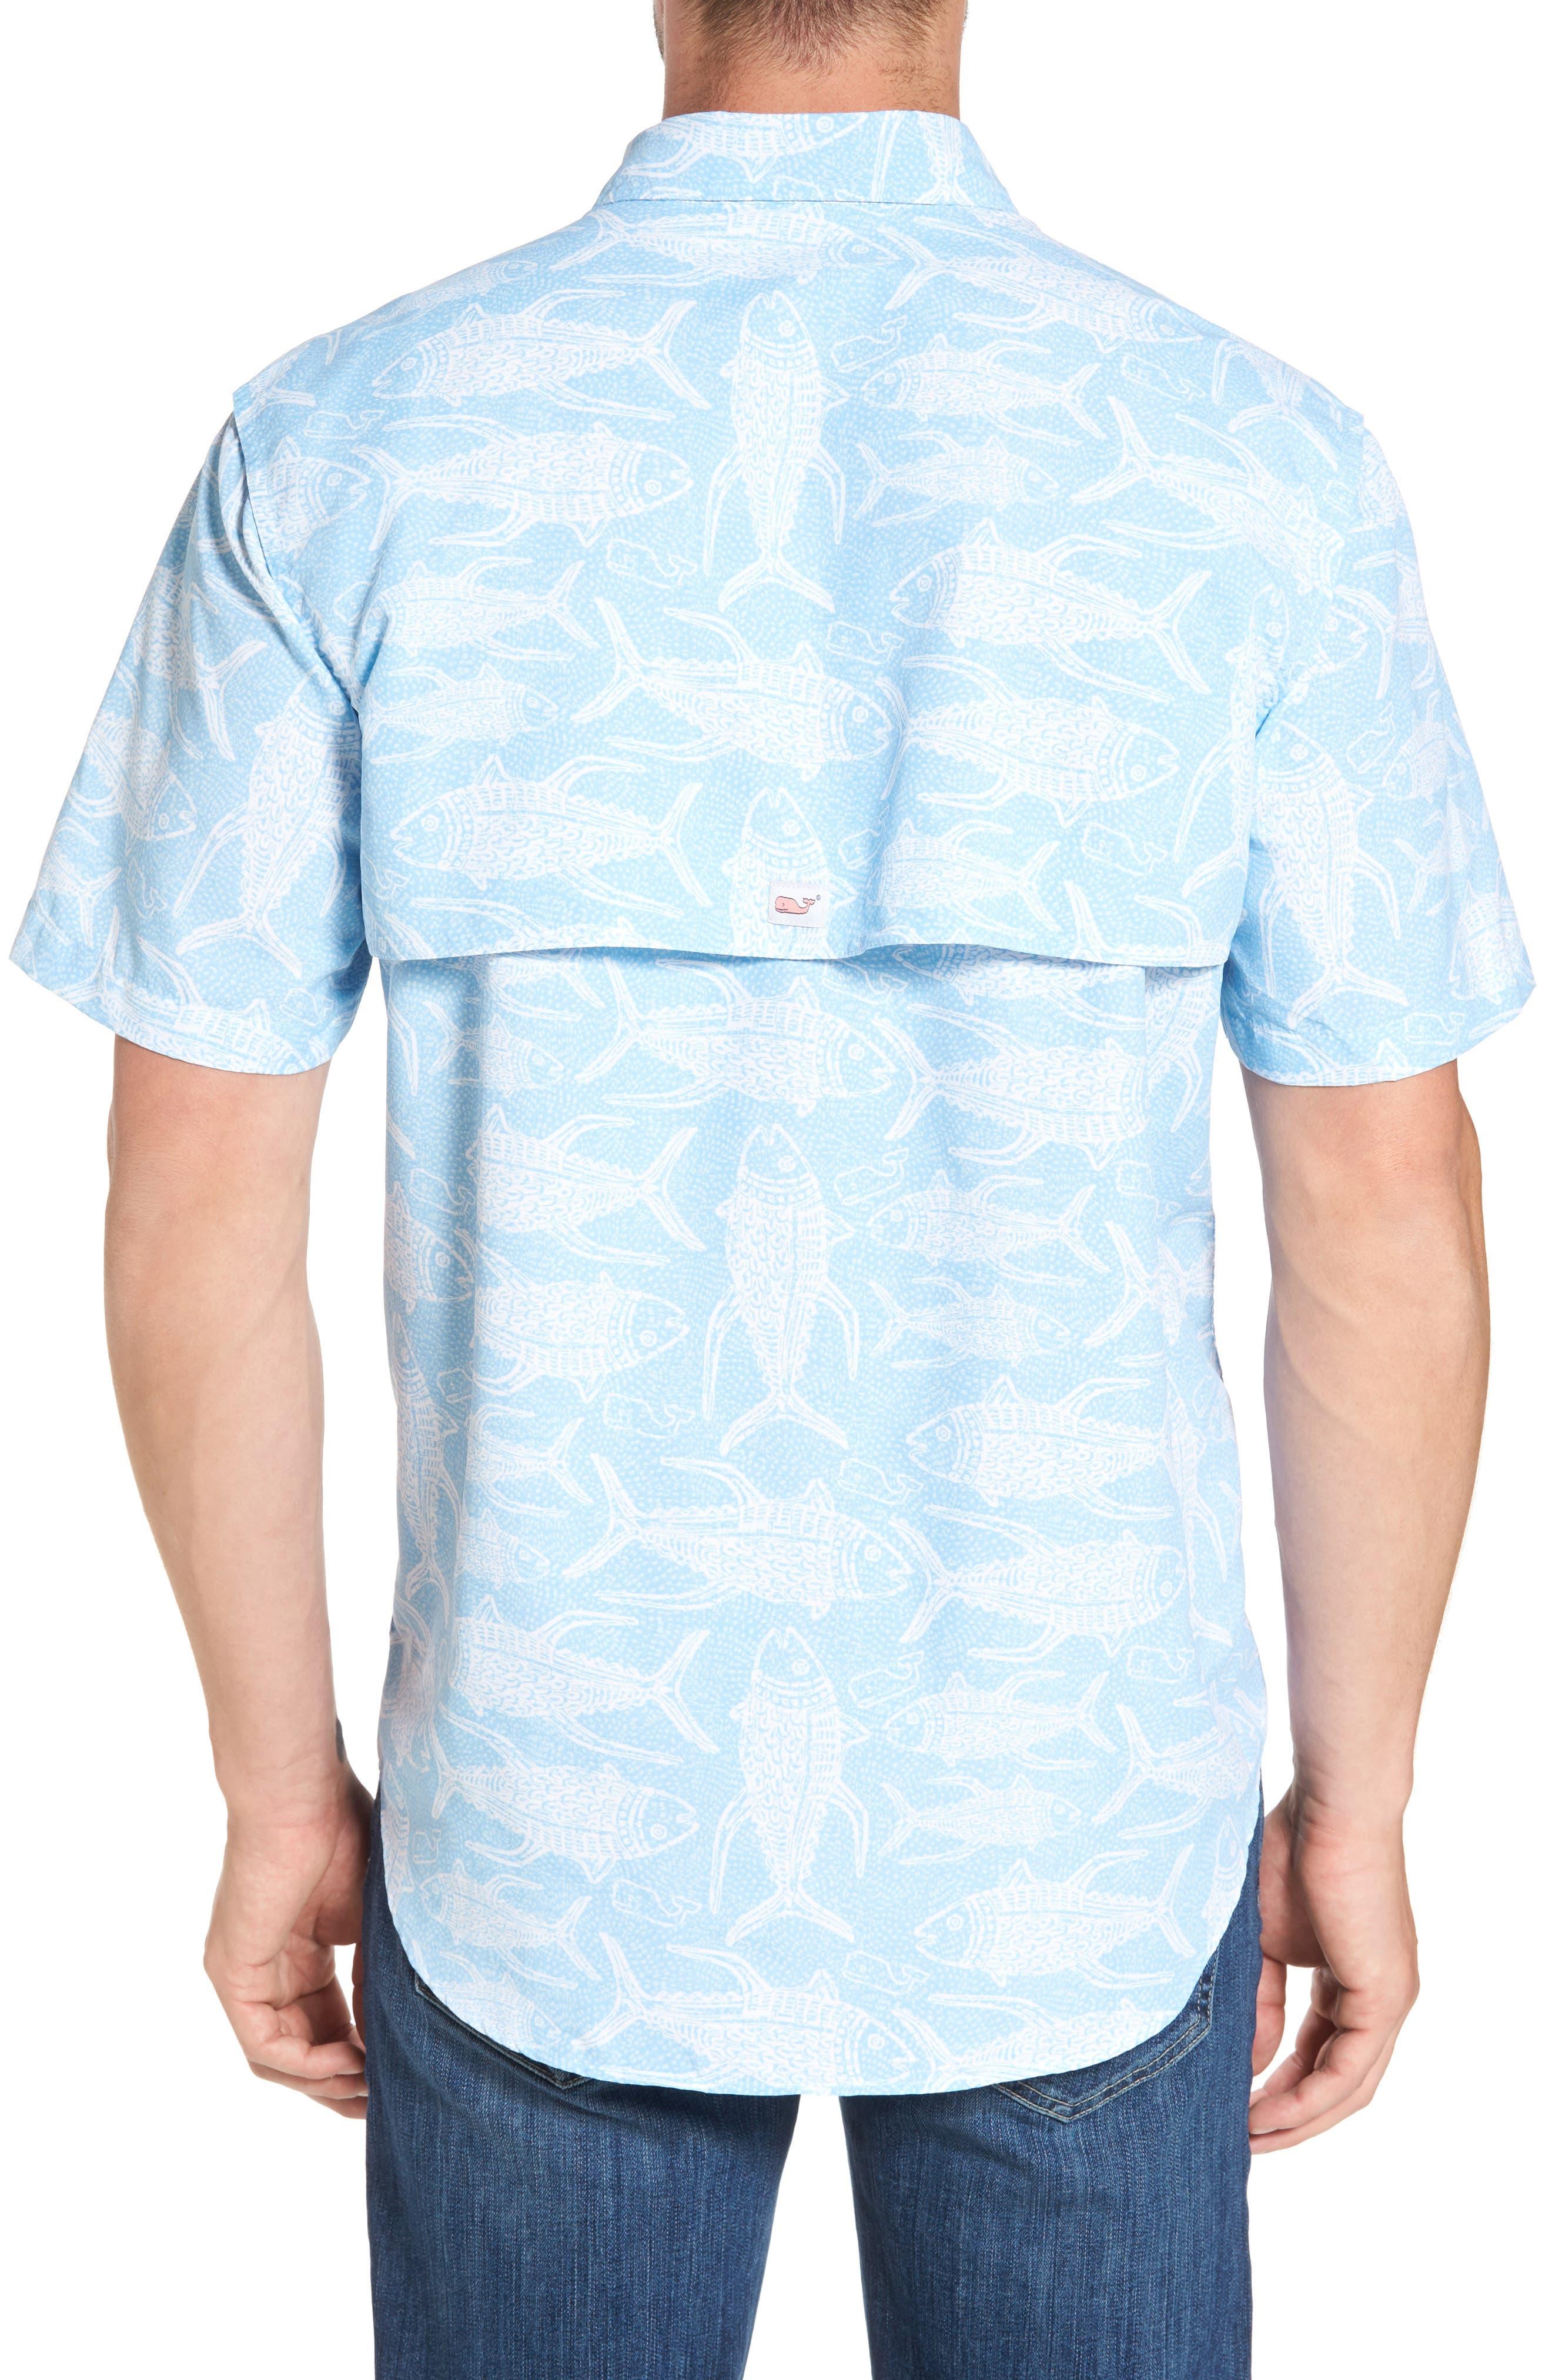 VINEYARD VINES,                             Tuna Batic Harbor Short Sleeve Sport Shirt,                             Alternate thumbnail 2, color,                             456